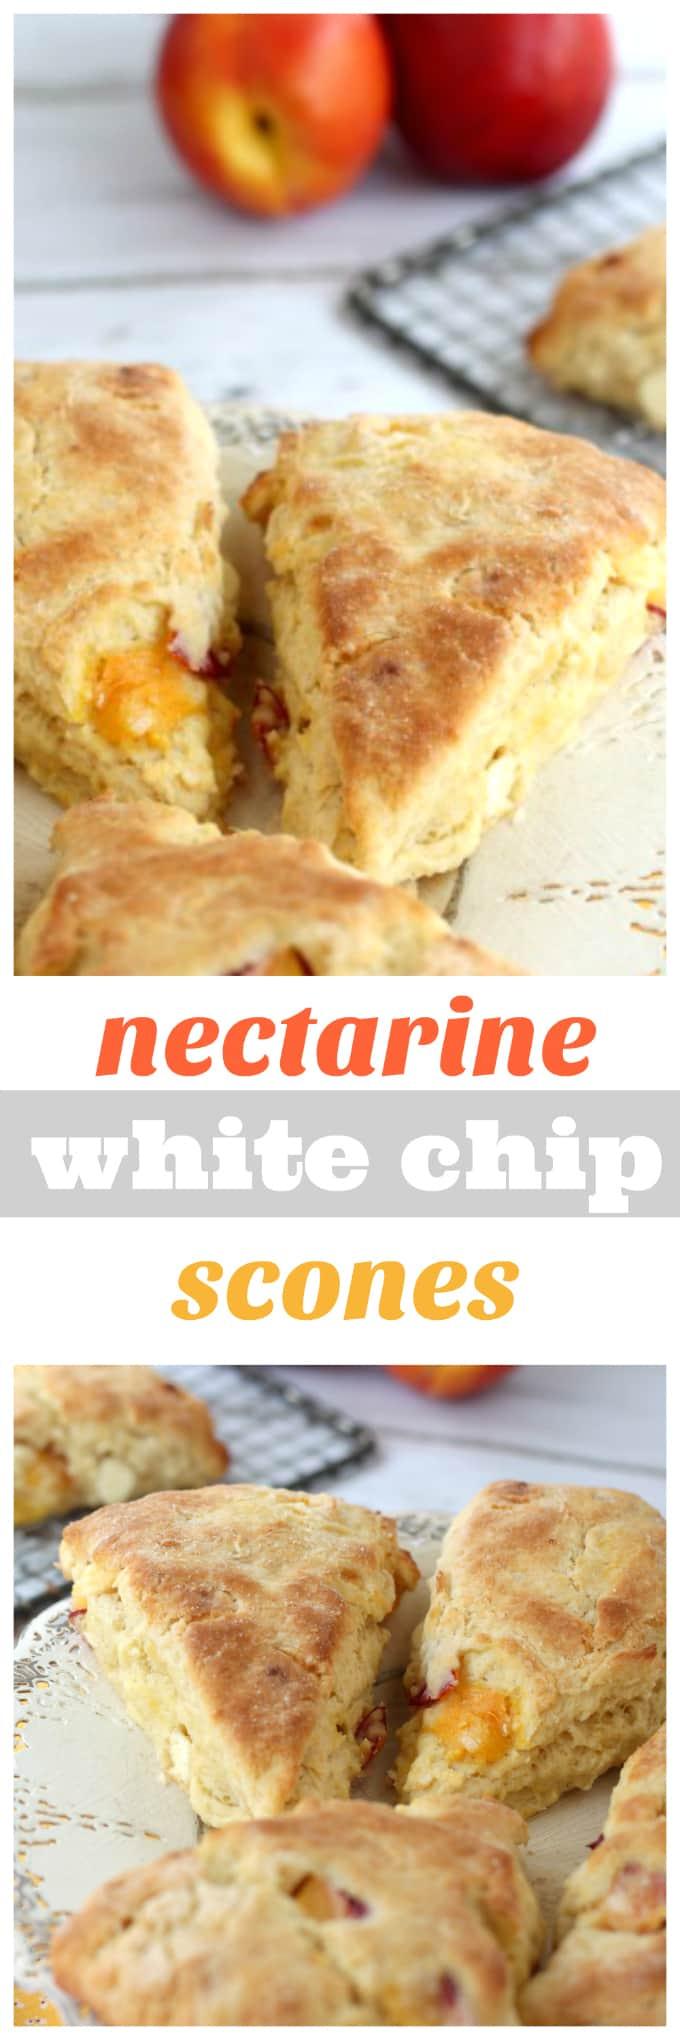 nectarine white chip scones @createdbydiane